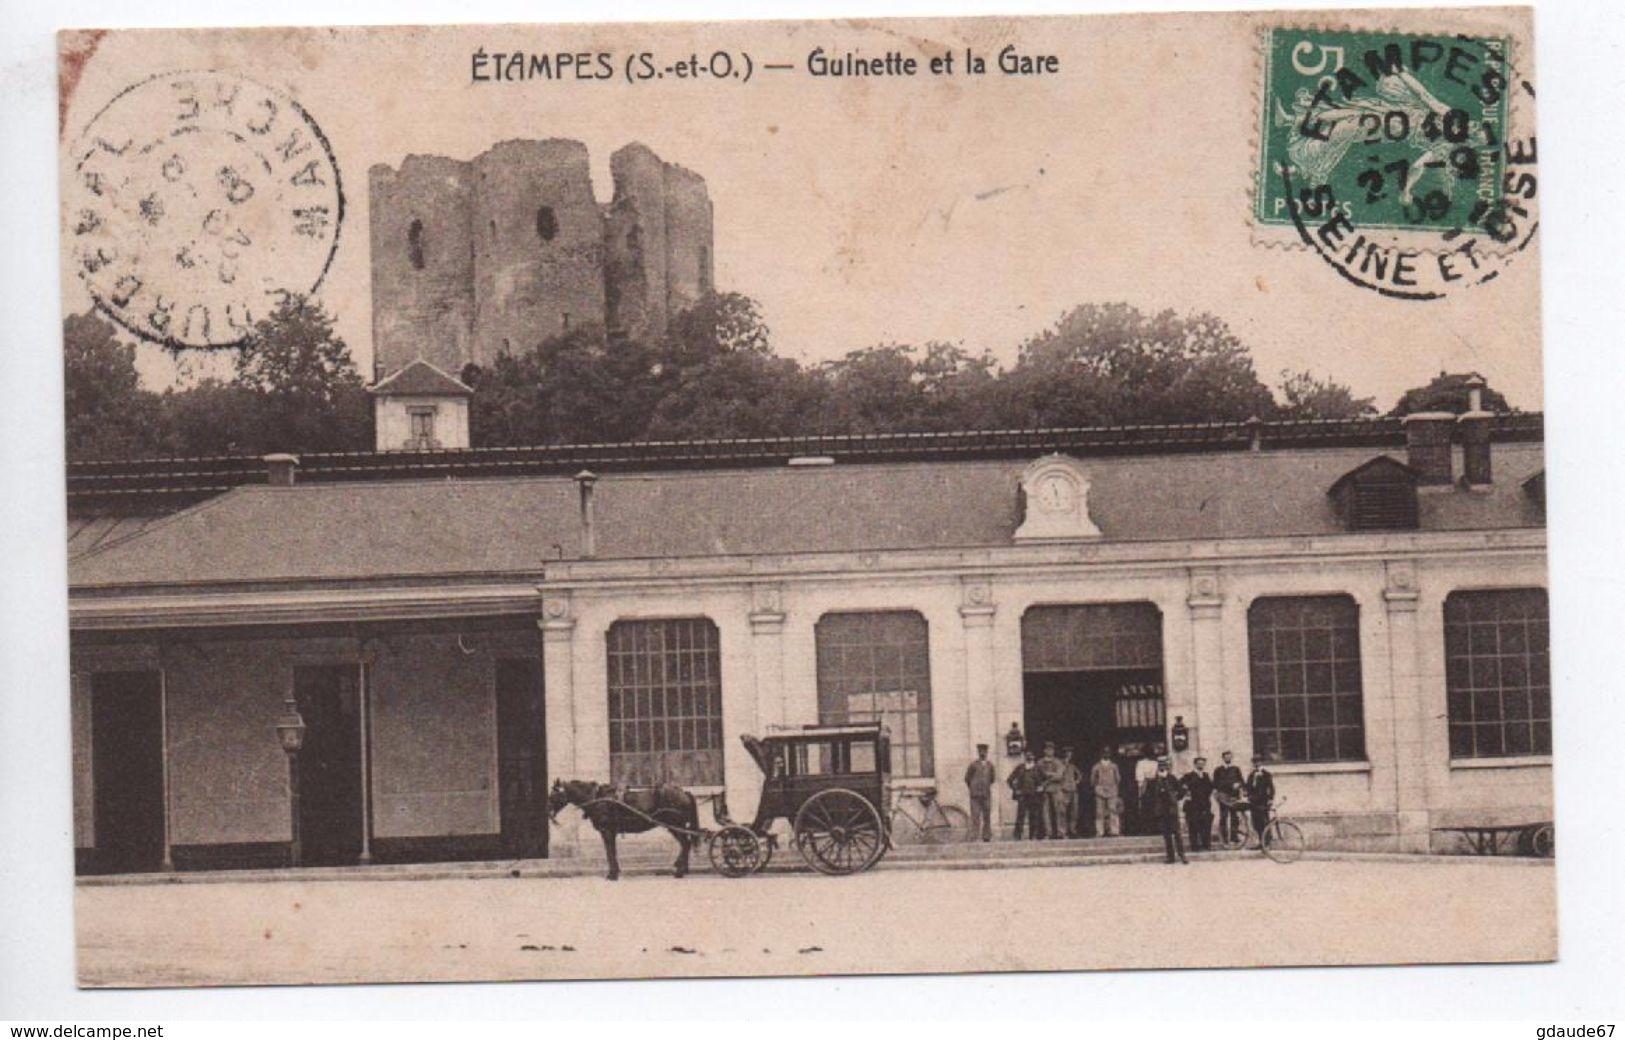 ETAMPES (91) - GUINETTE ET LA GARE - Etampes